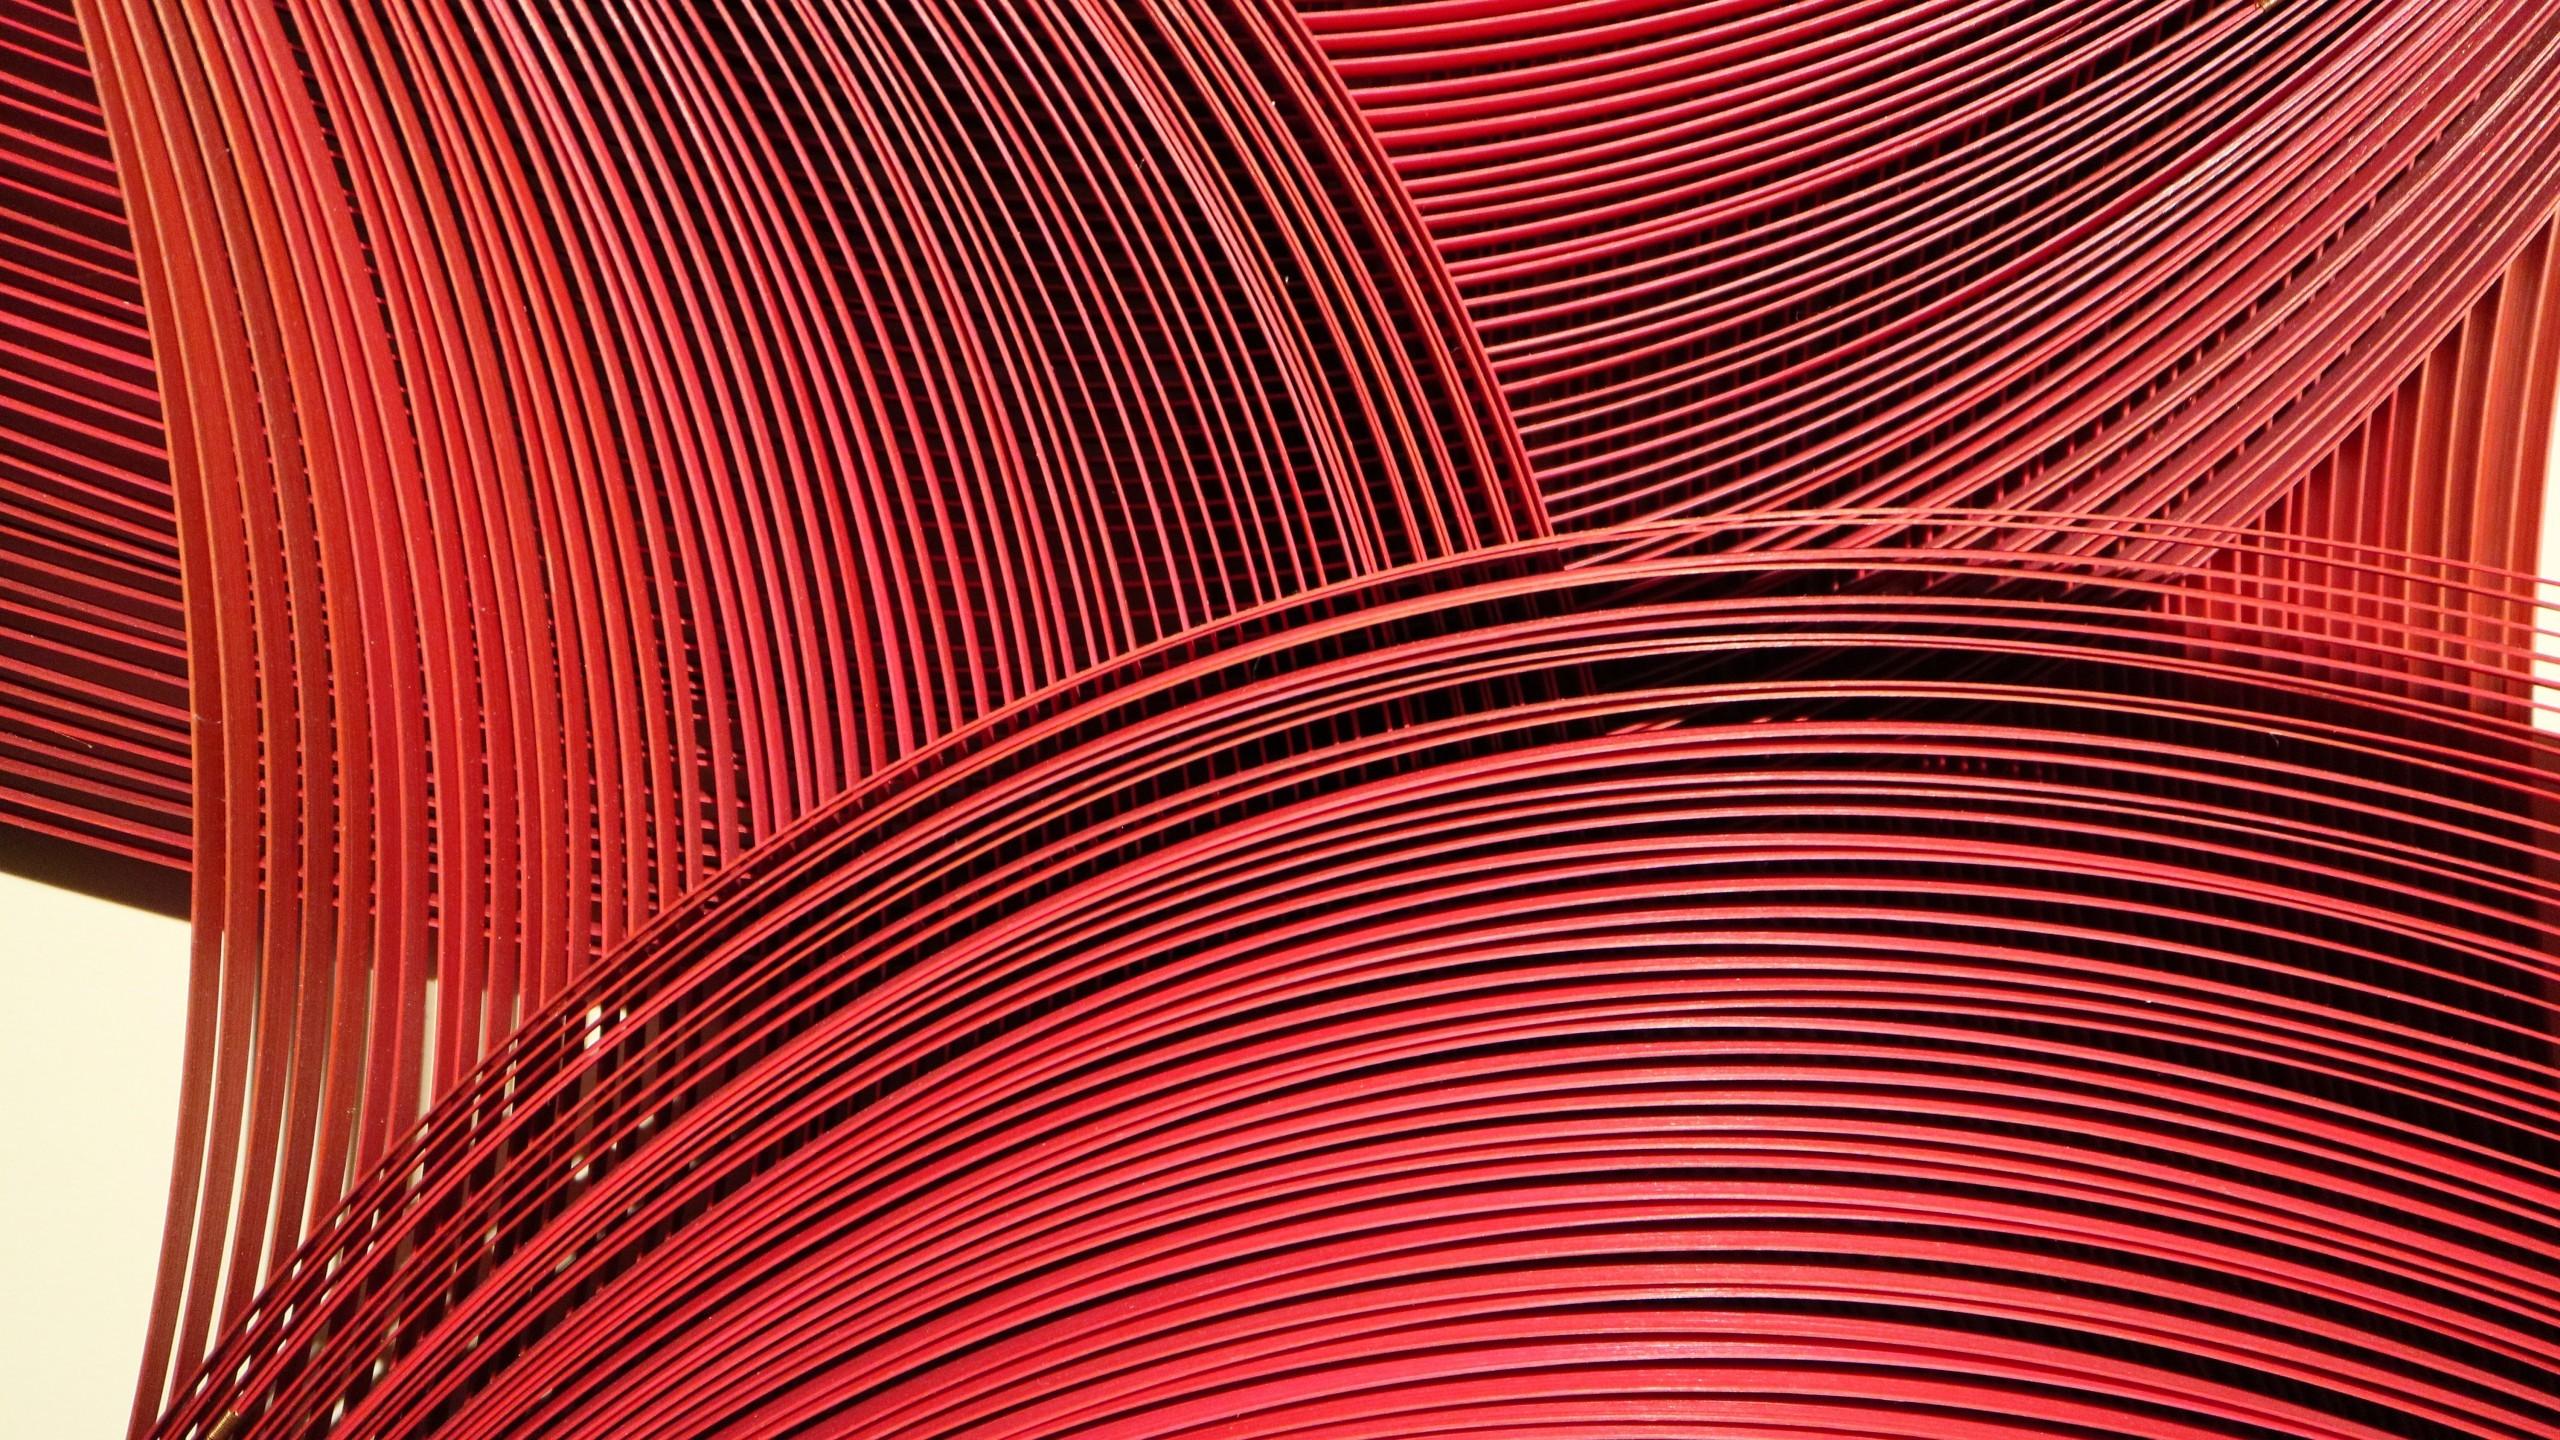 Abstract / Texture Wallpaper